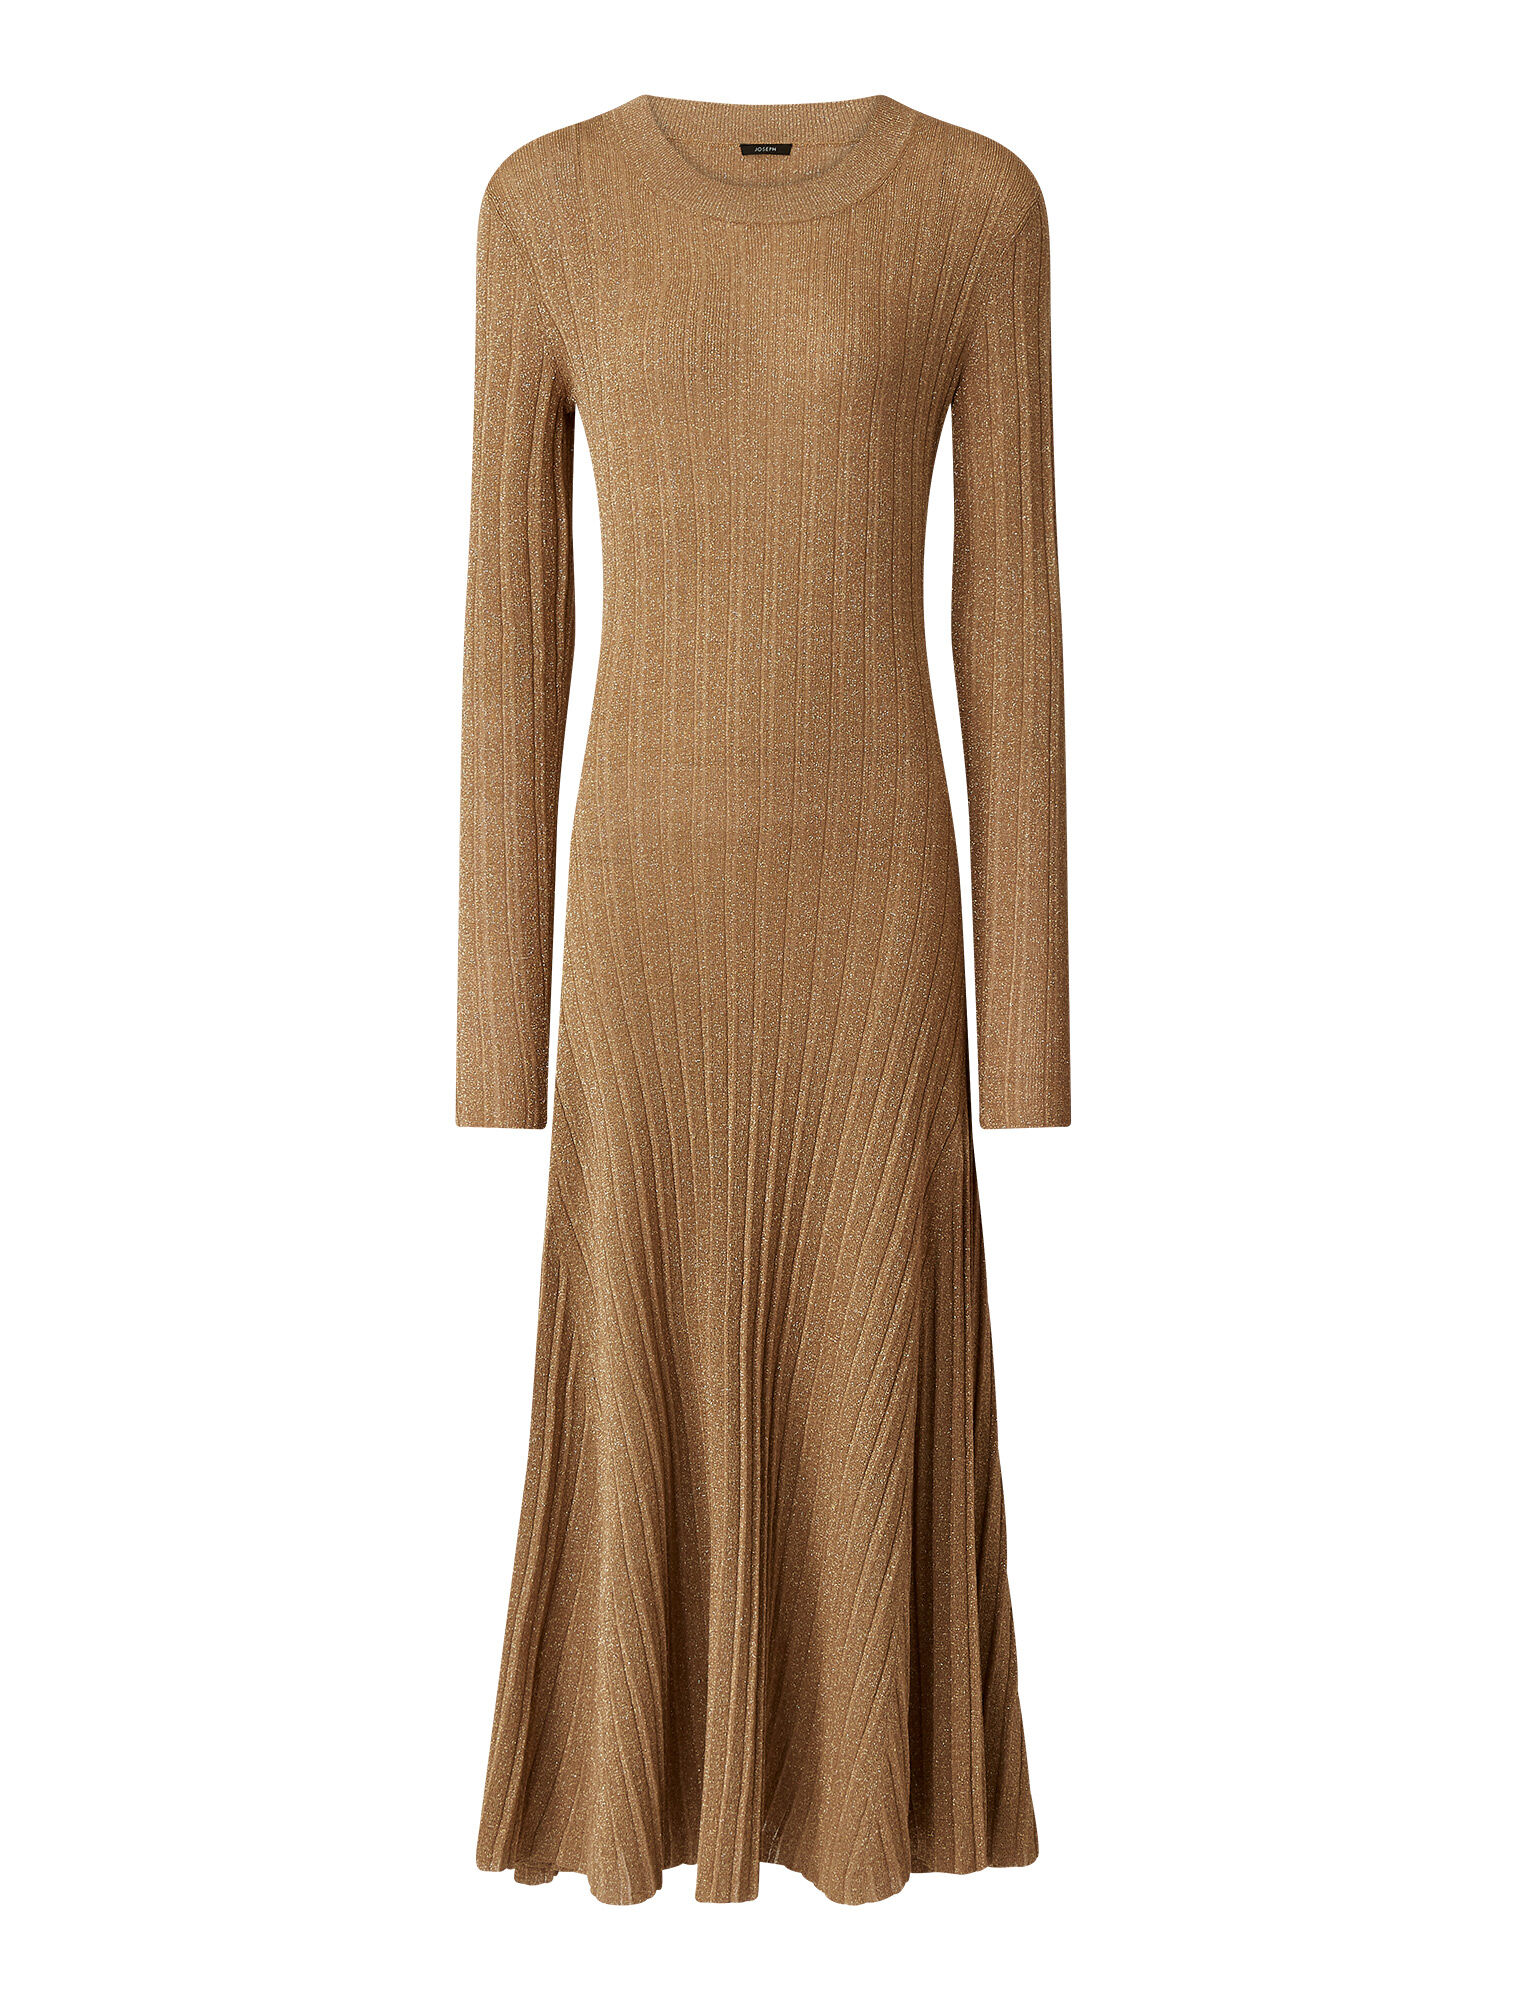 Joseph, Lurex Diva Dress, in CHAMPAGNE